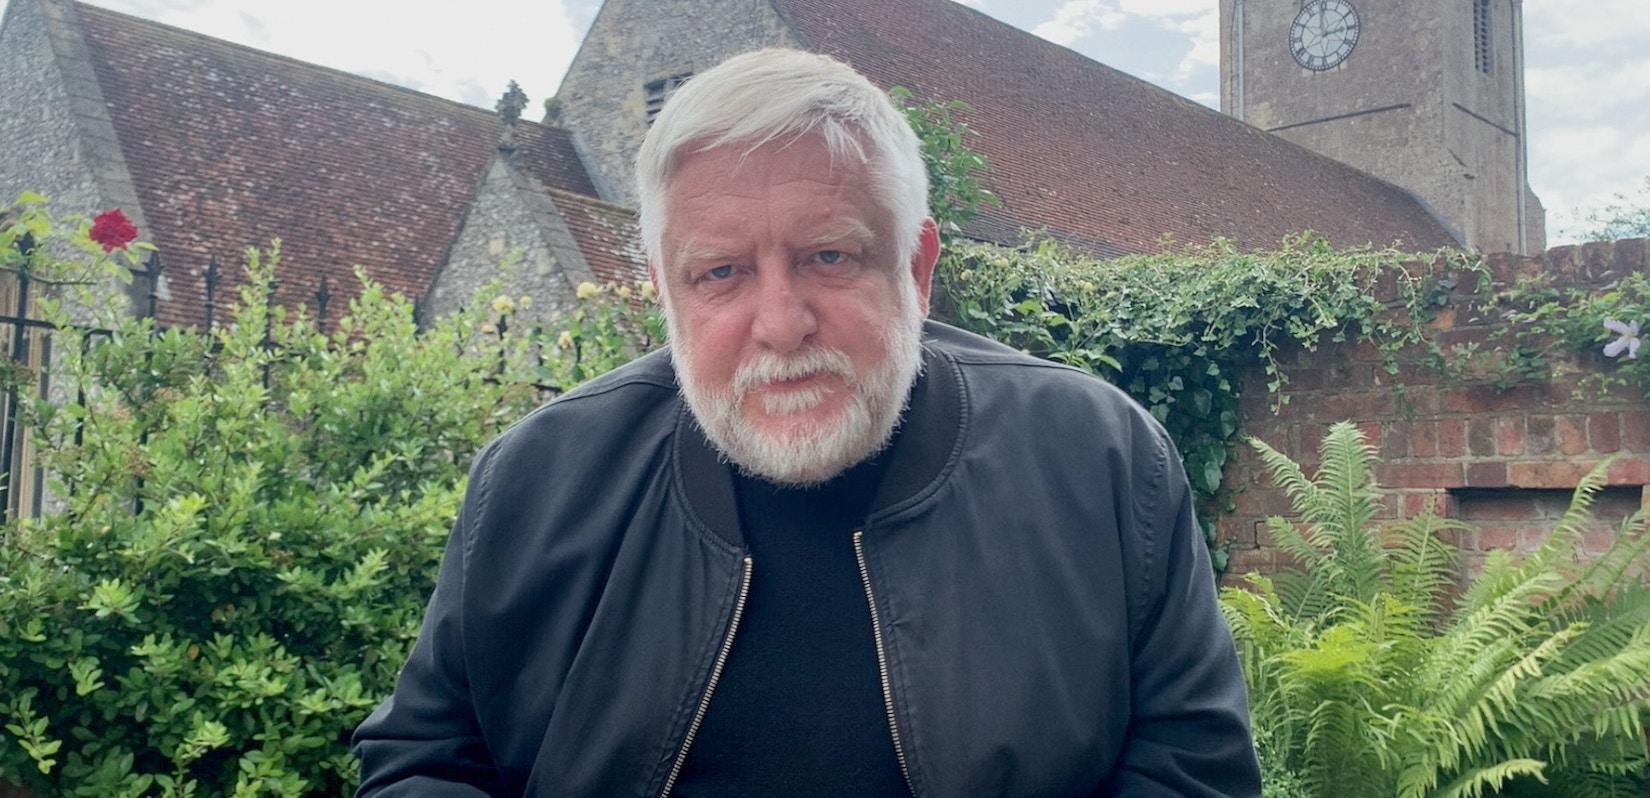 Donne Simon Russle Beale Read By 5